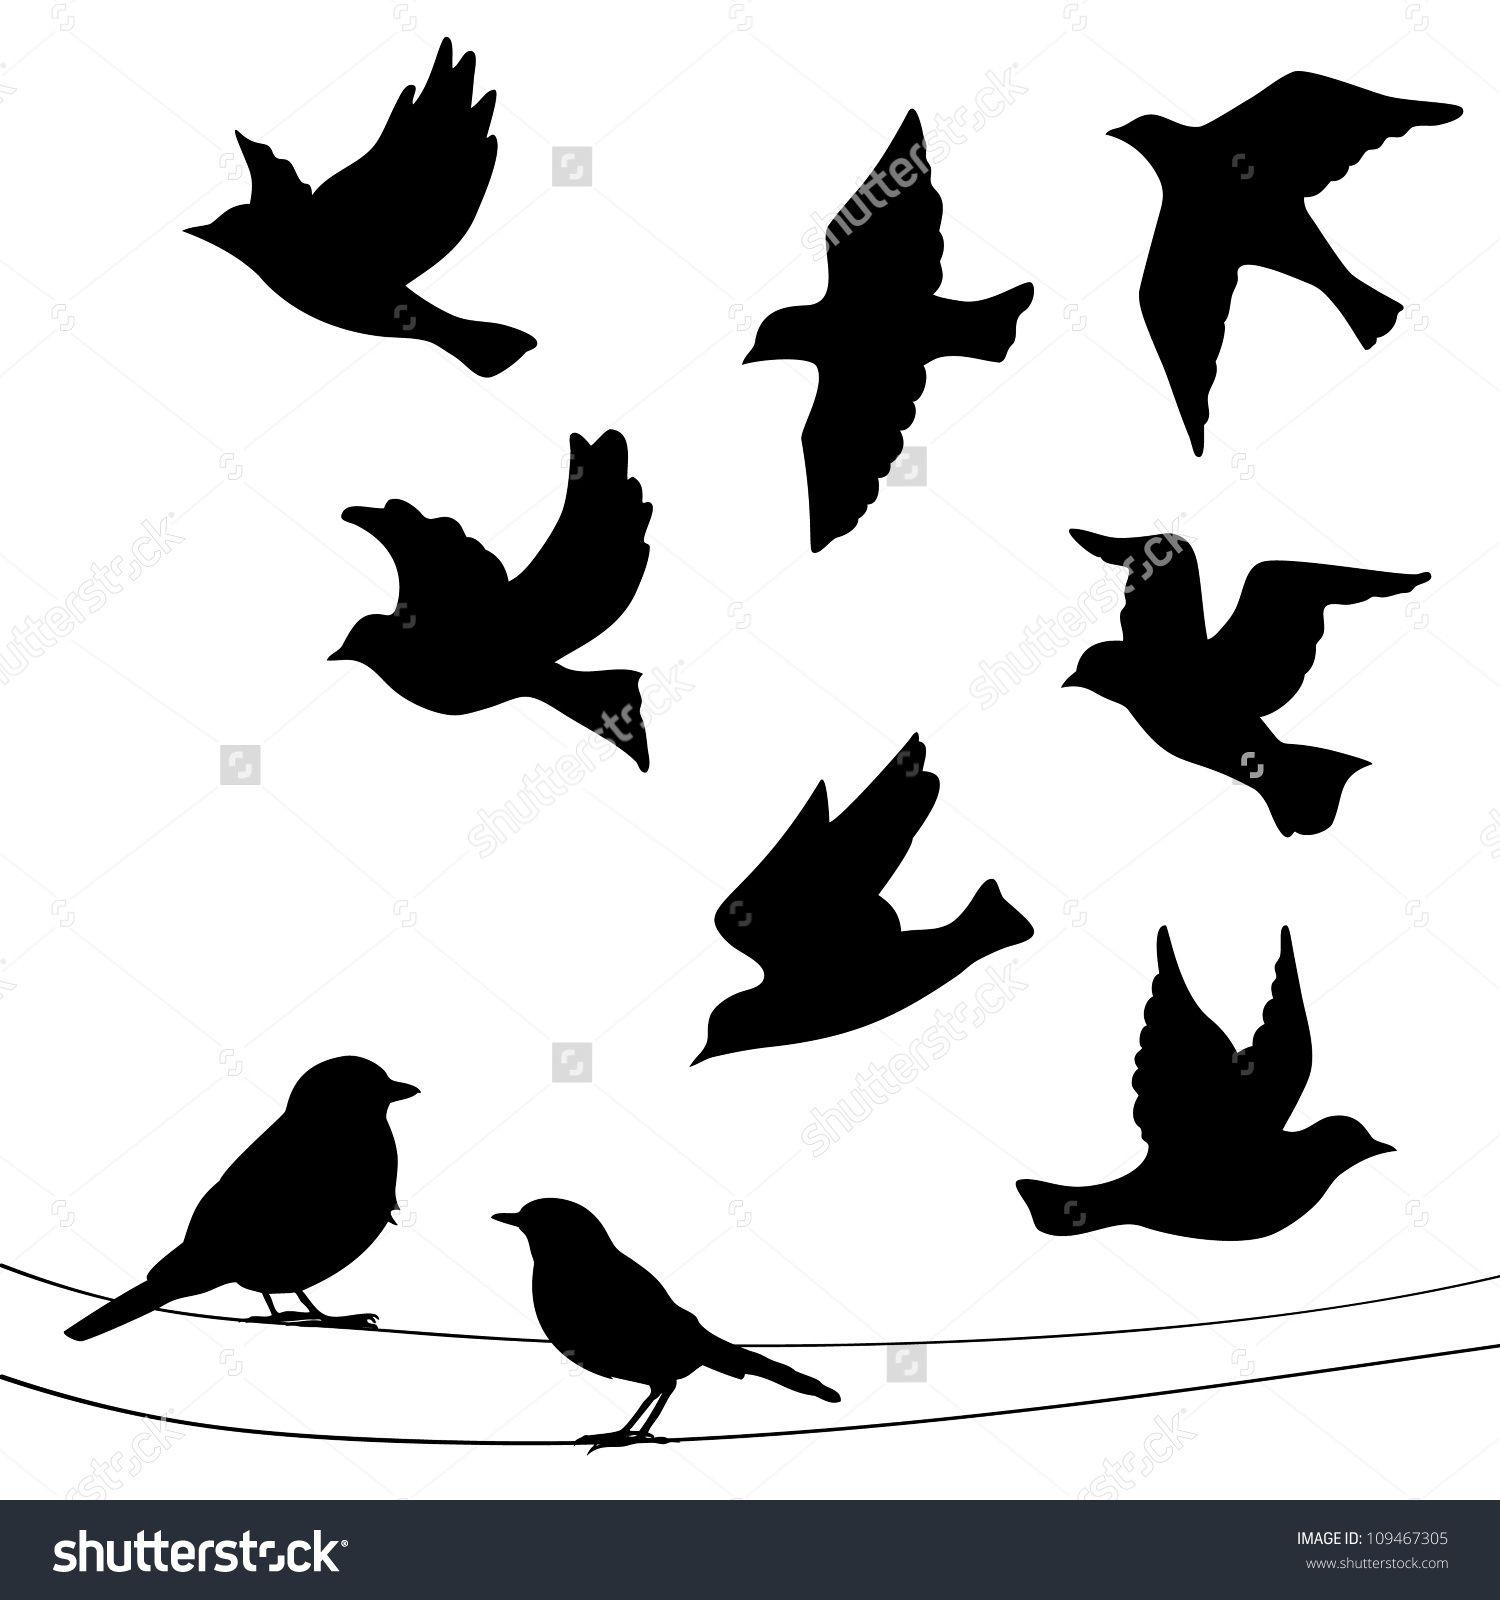 bird silhouette google zoeken silhouetten pinterest silhouetten. Black Bedroom Furniture Sets. Home Design Ideas